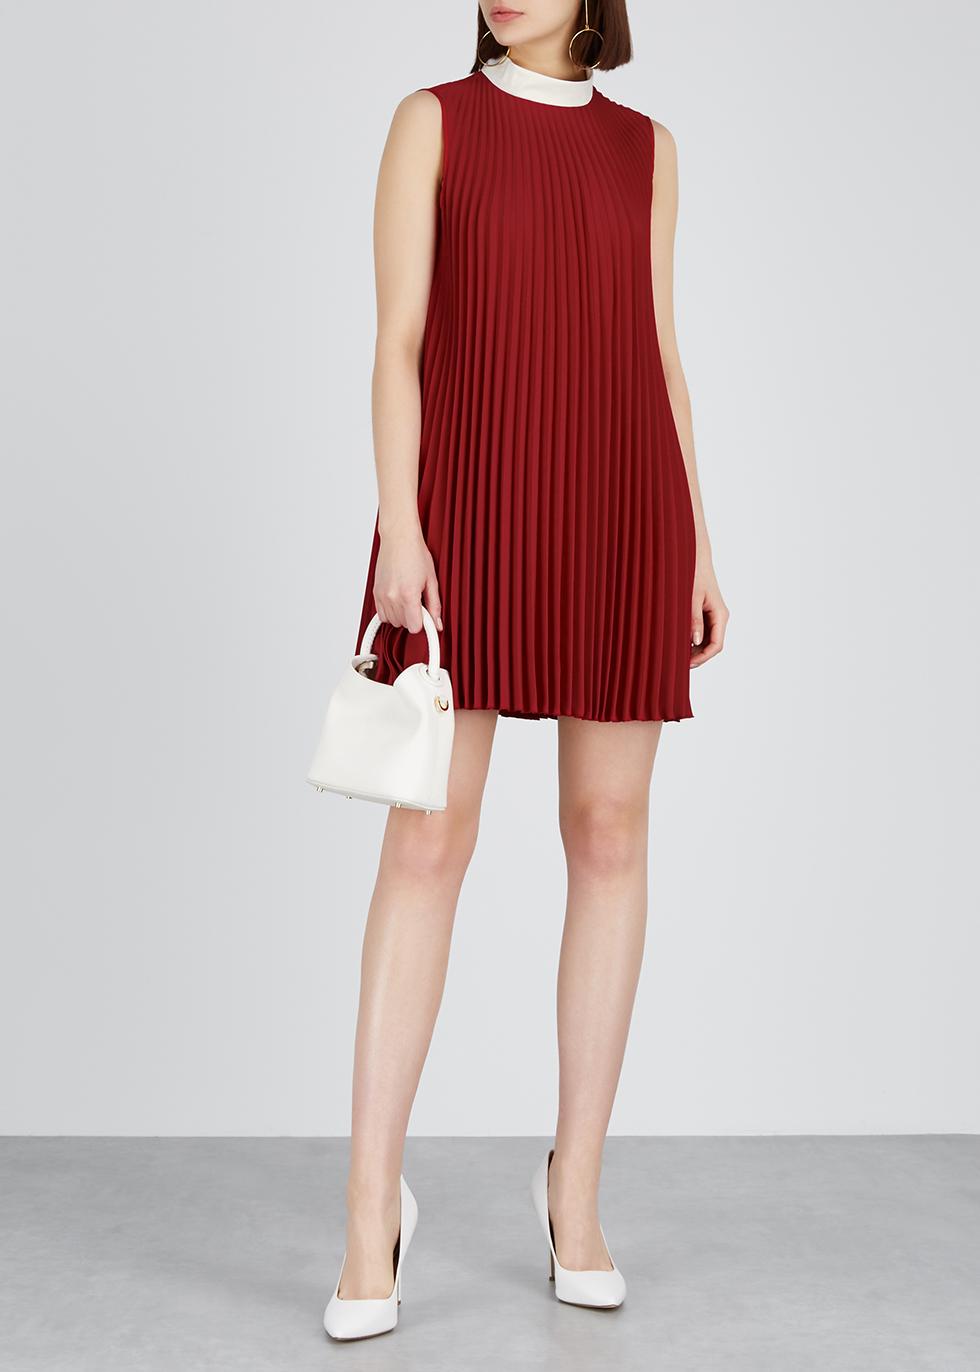 022c75e9cbc RED Valentino Dresses